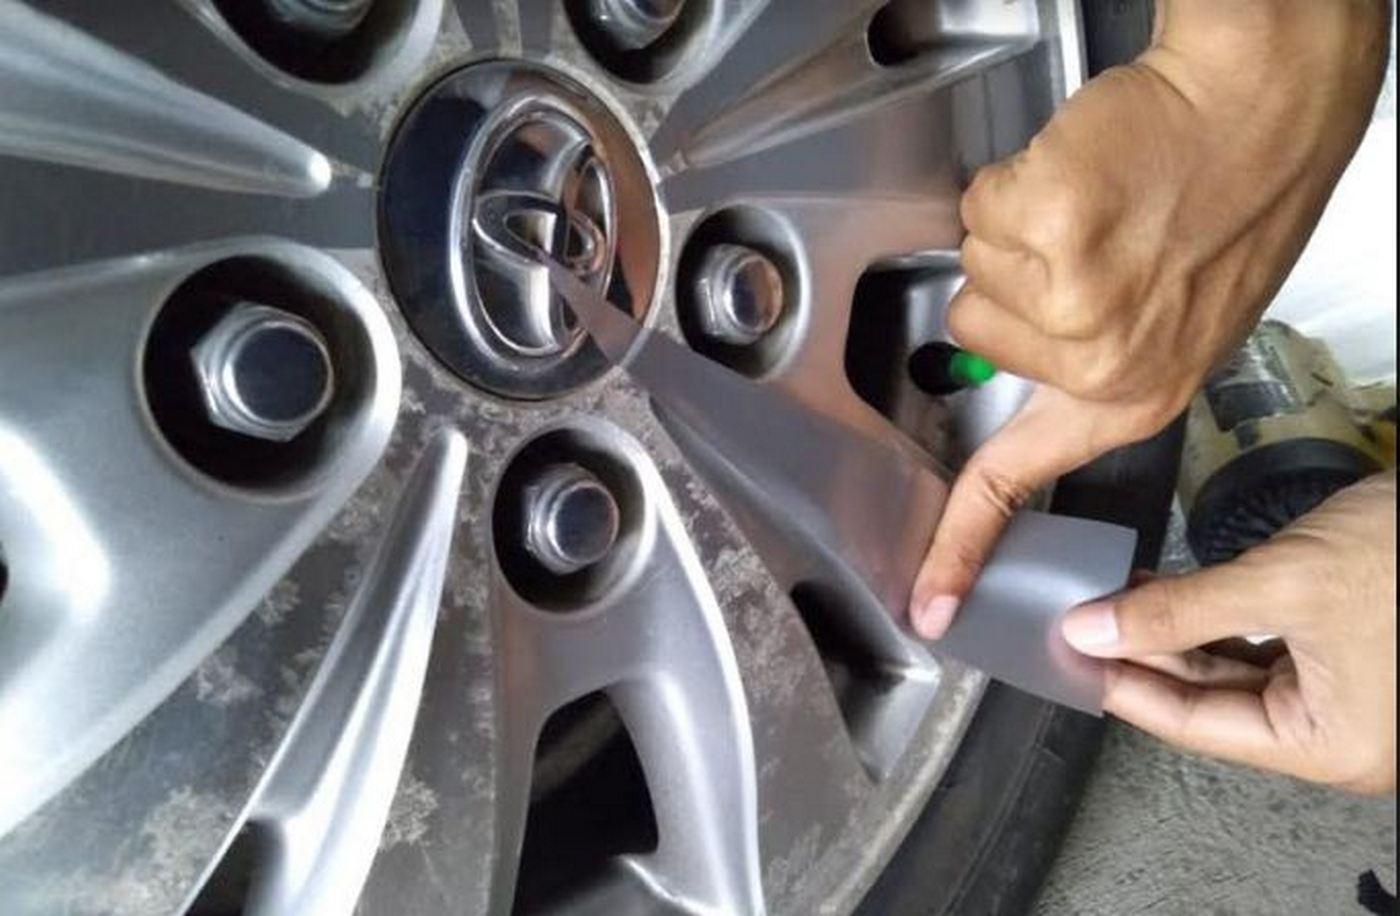 Stiker Velg Mobil Untuk Percantik Kendaraan Cuttingstickerupdate